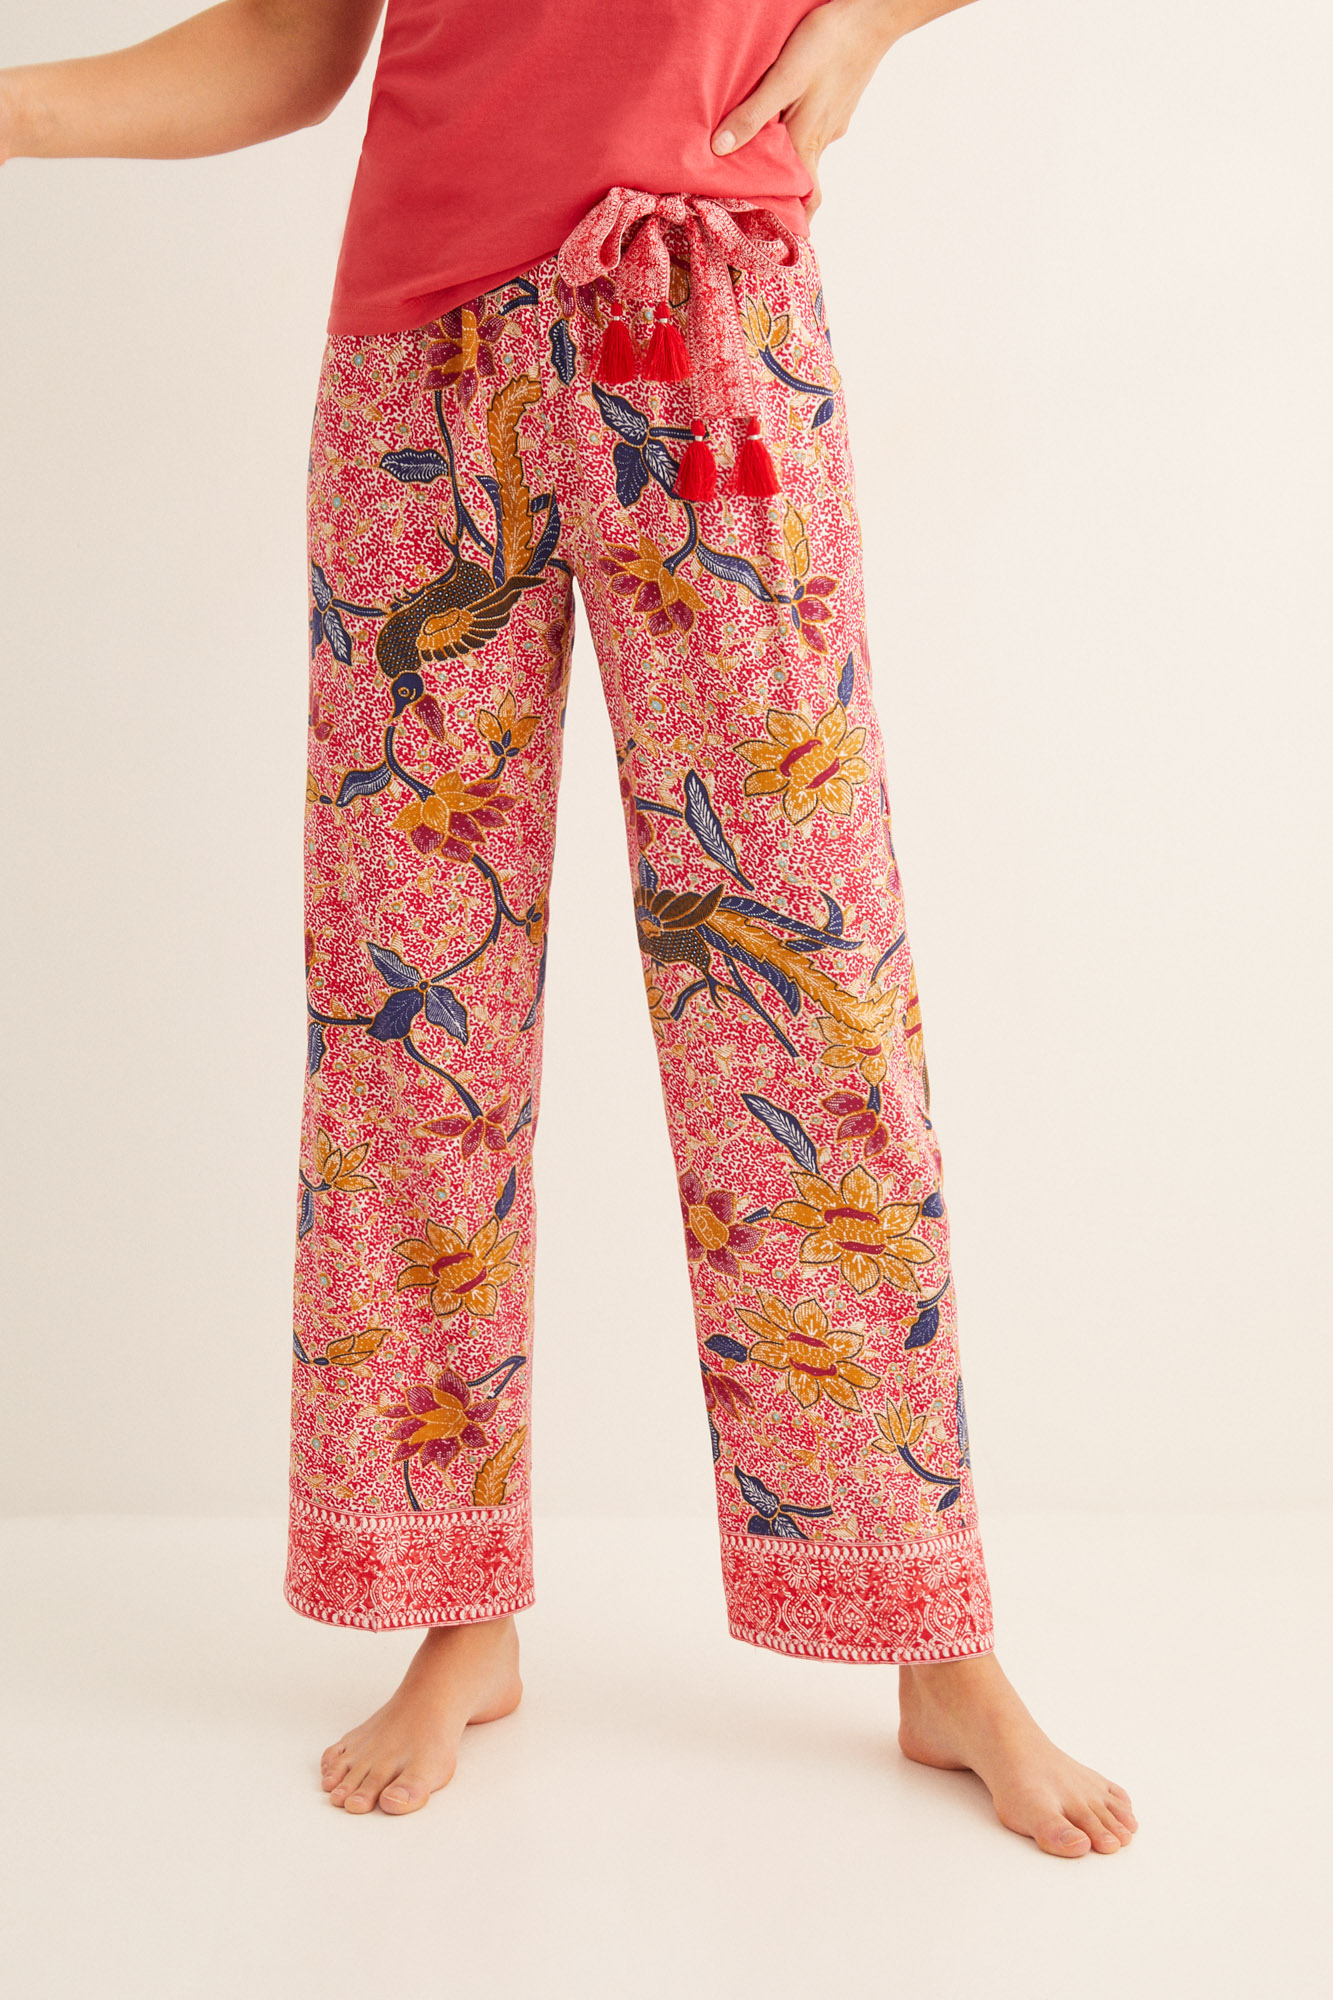 Pantalón largo estampado | Pantalones | Women'secret